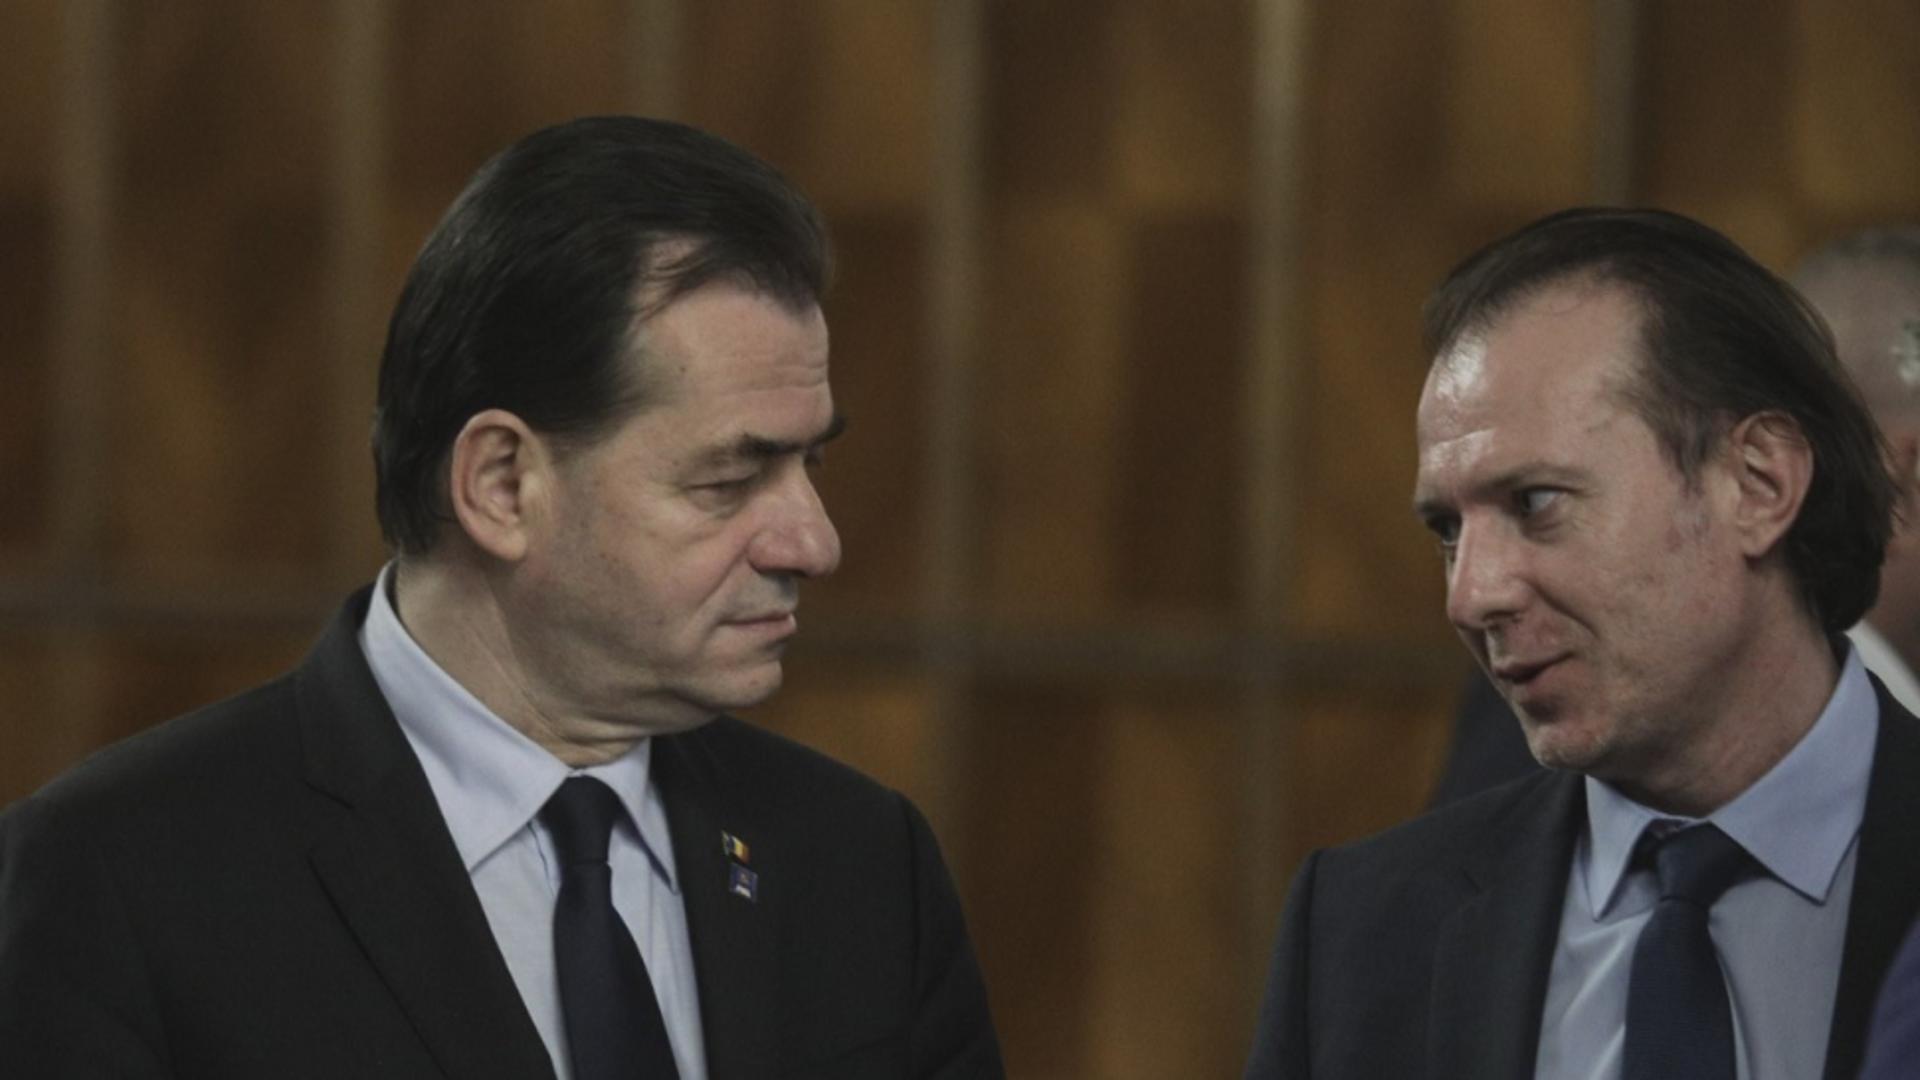 Florin Cîțu și Ludovic Orban, PNL Foto: INQUAM